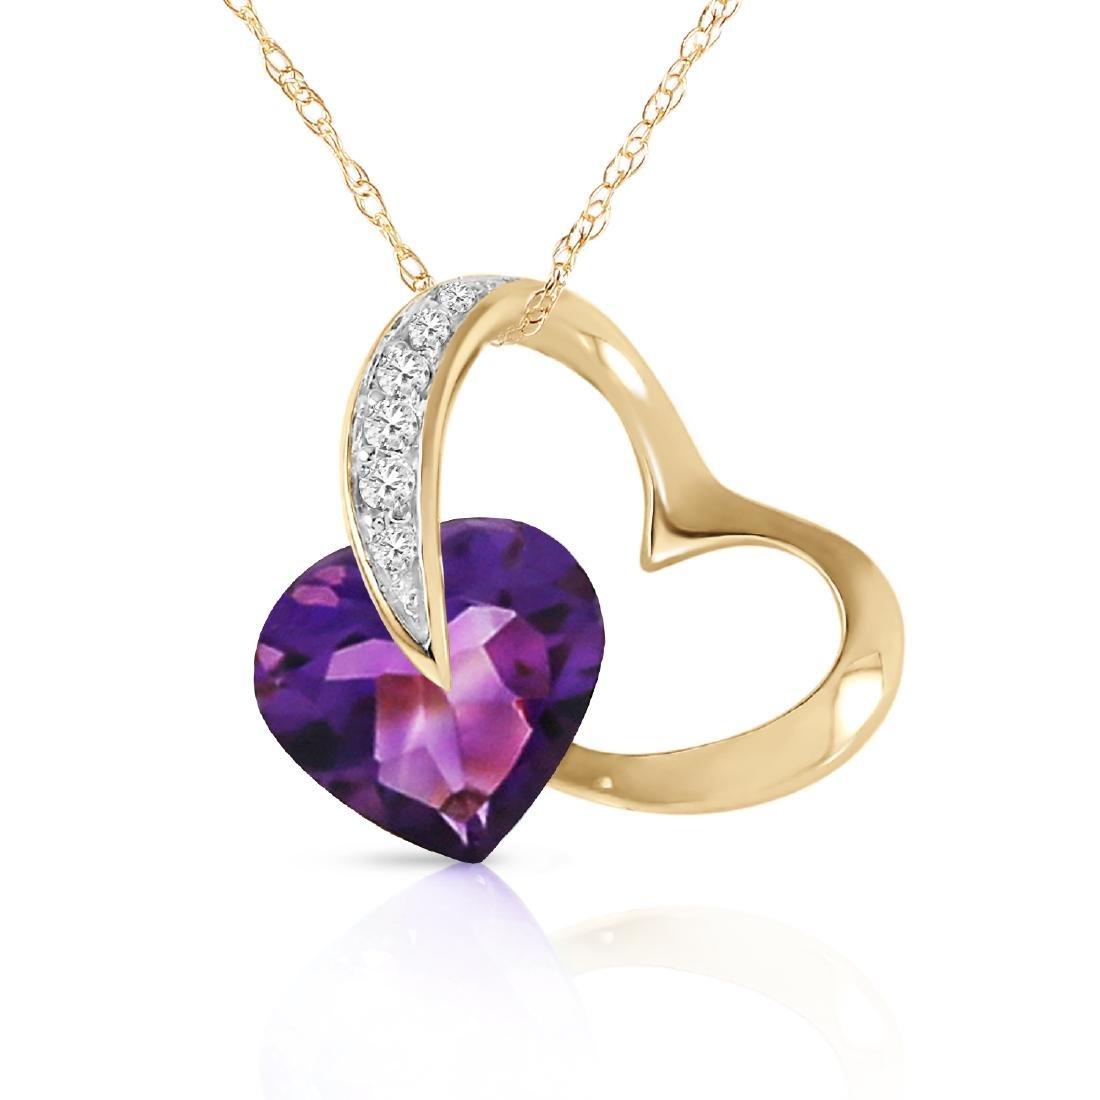 Genuine 3.2 ctw Amethyst & Diamond Necklace Jewelry